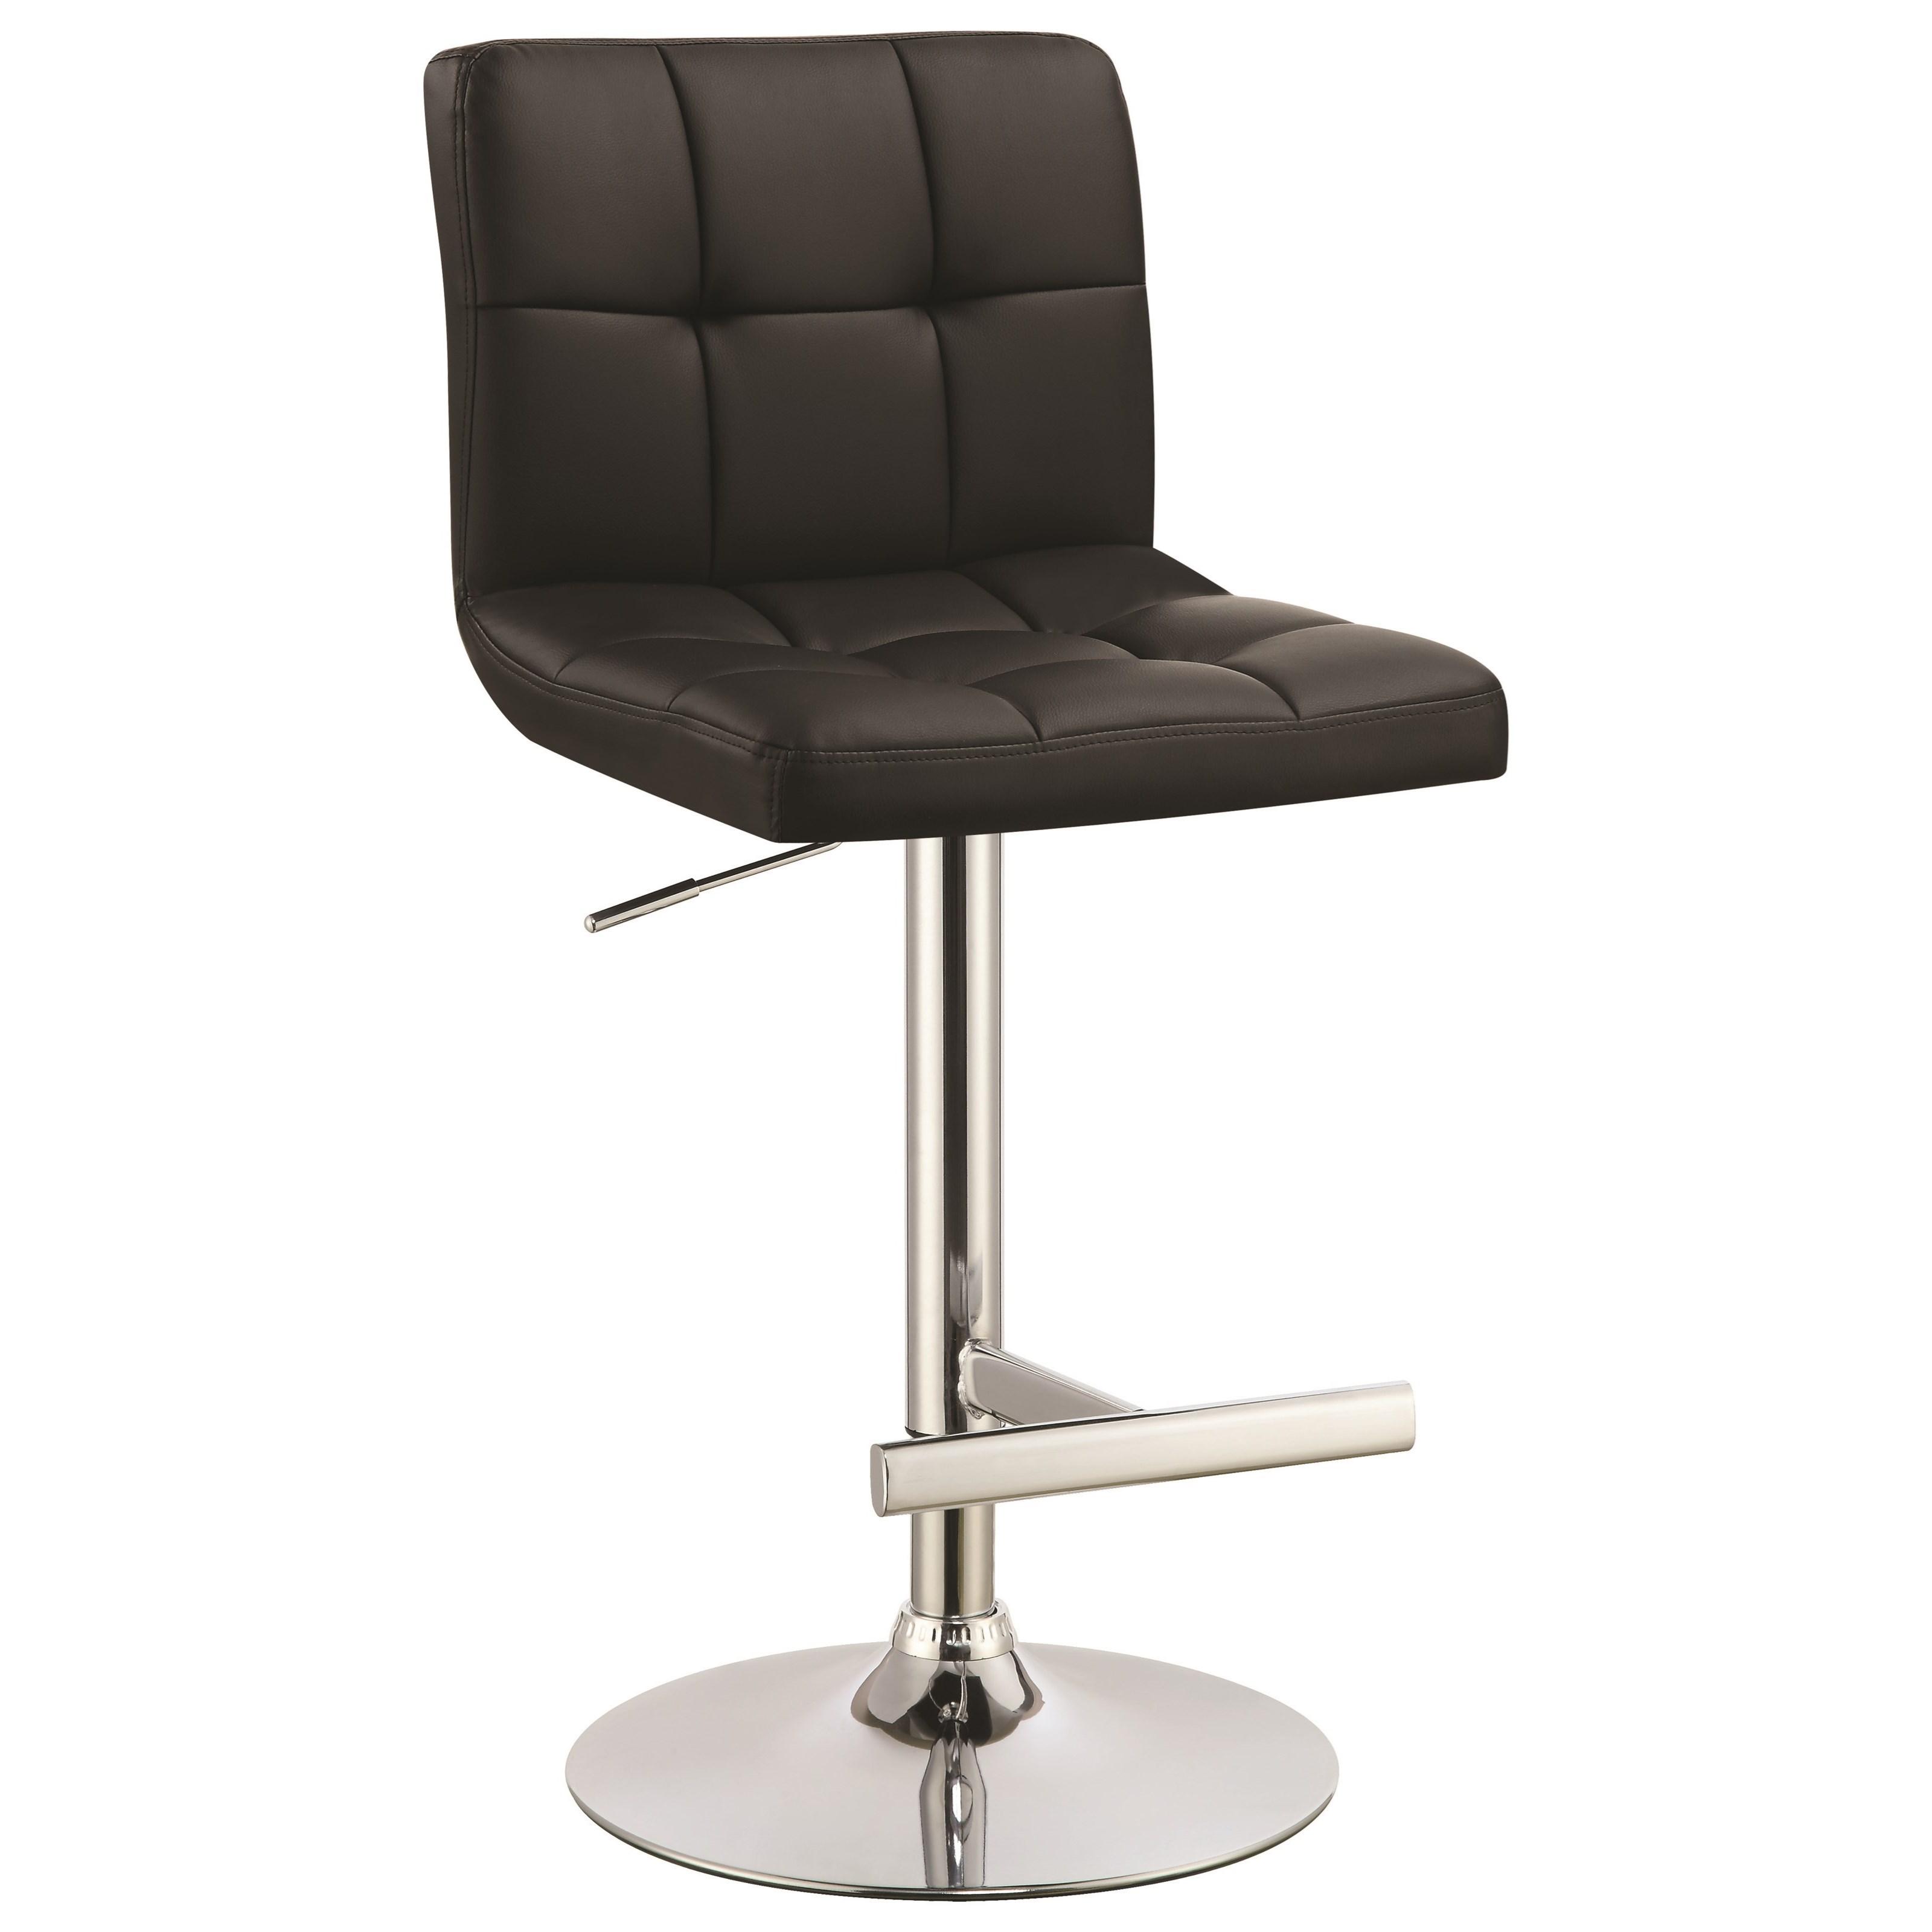 "Dining Chairs and Bar Stools 29"" Barstool by Coaster at Suburban Furniture"